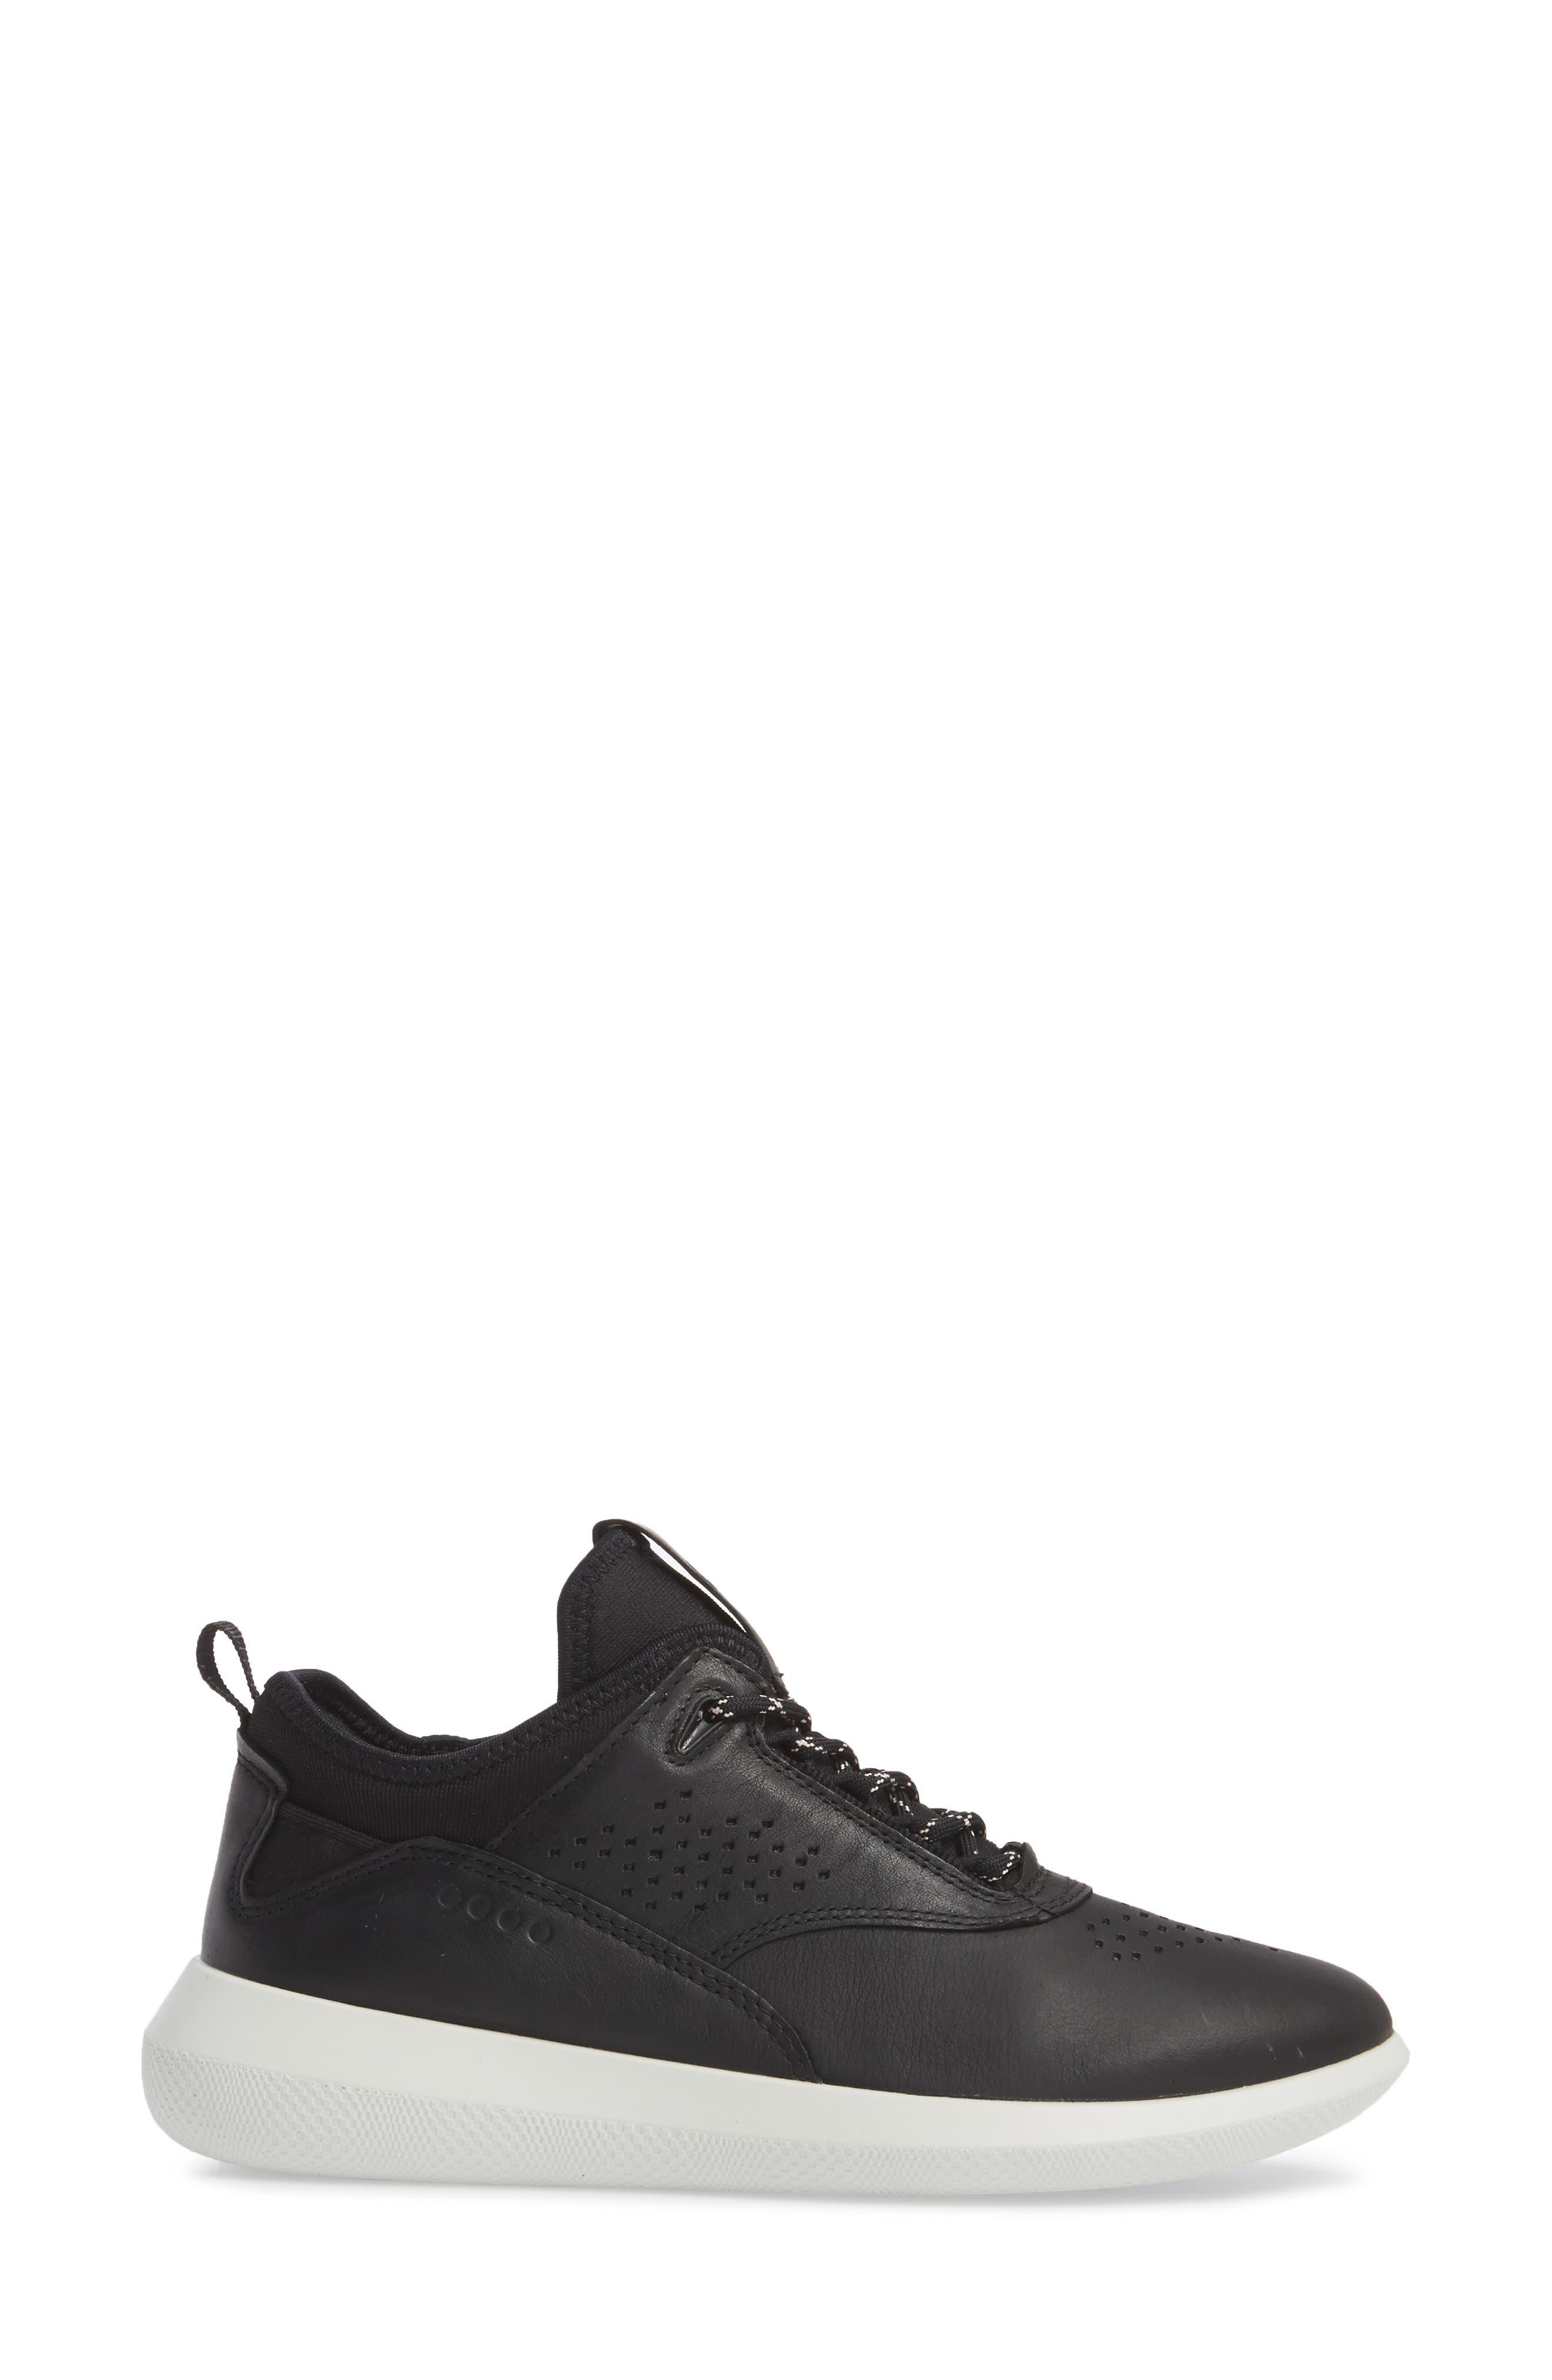 Scinapse Sneaker,                             Alternate thumbnail 3, color,                             BLACK LEATHER